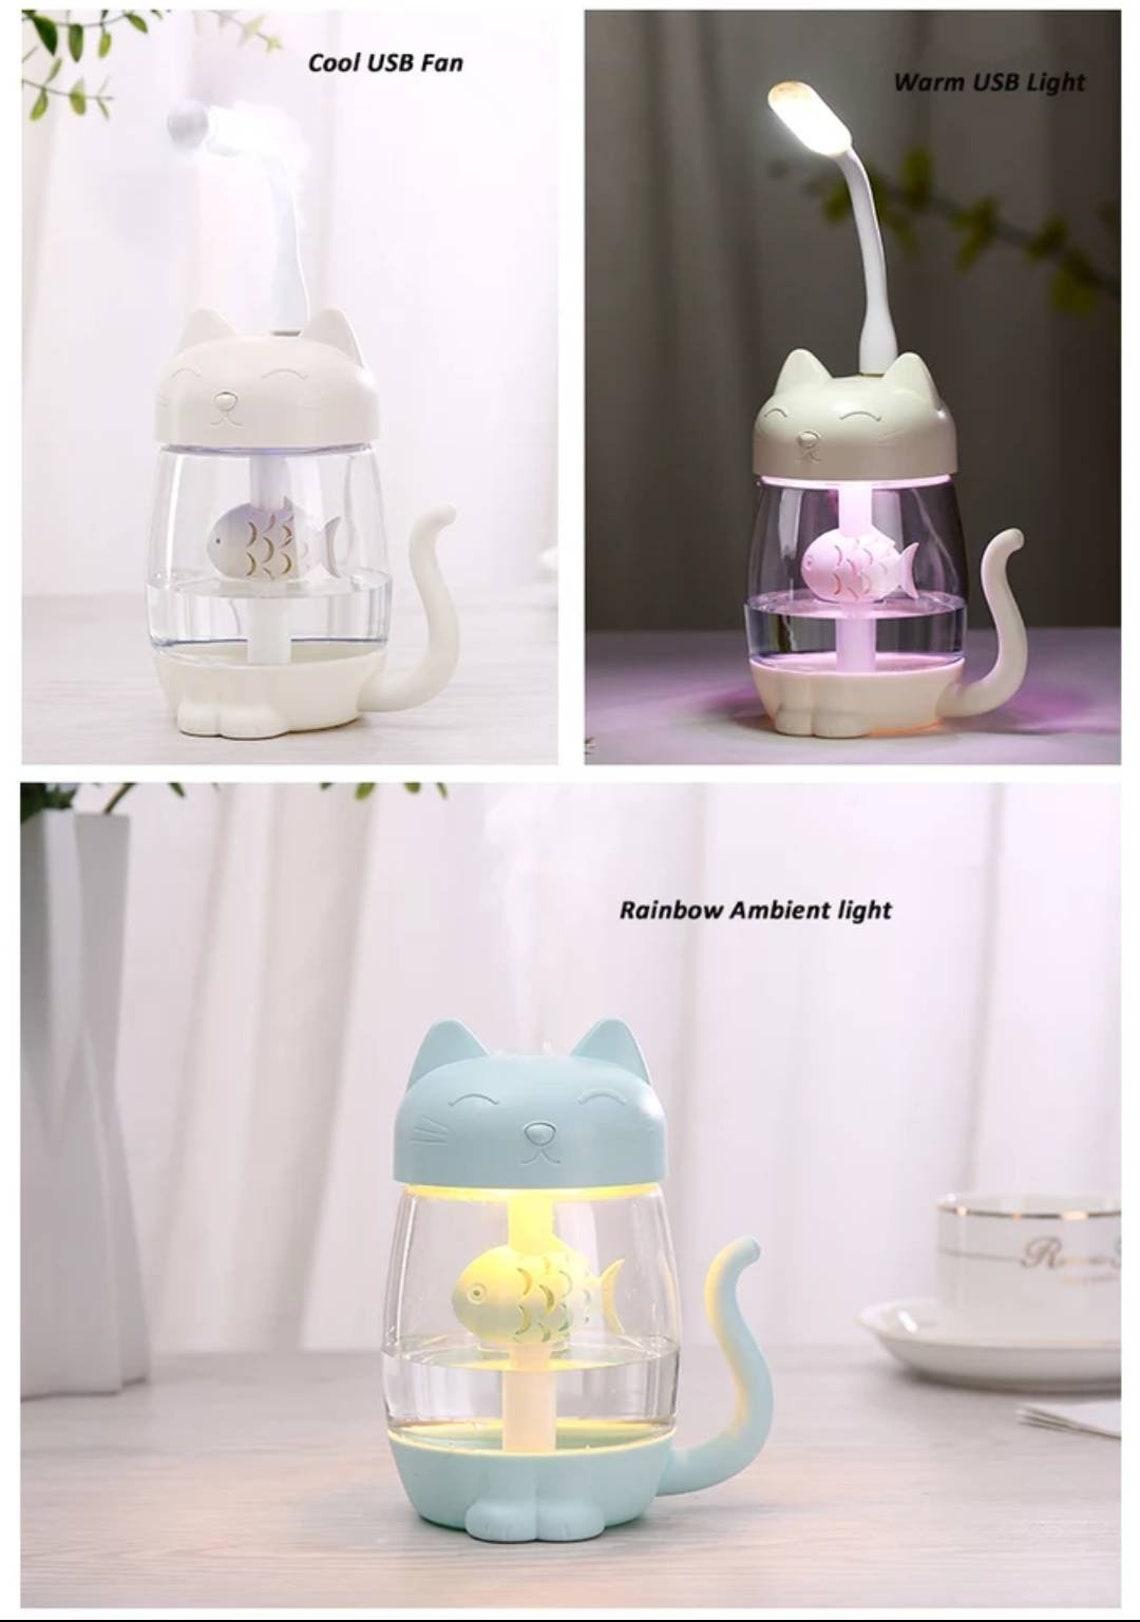 3 in 1 cute Cat Humidifier